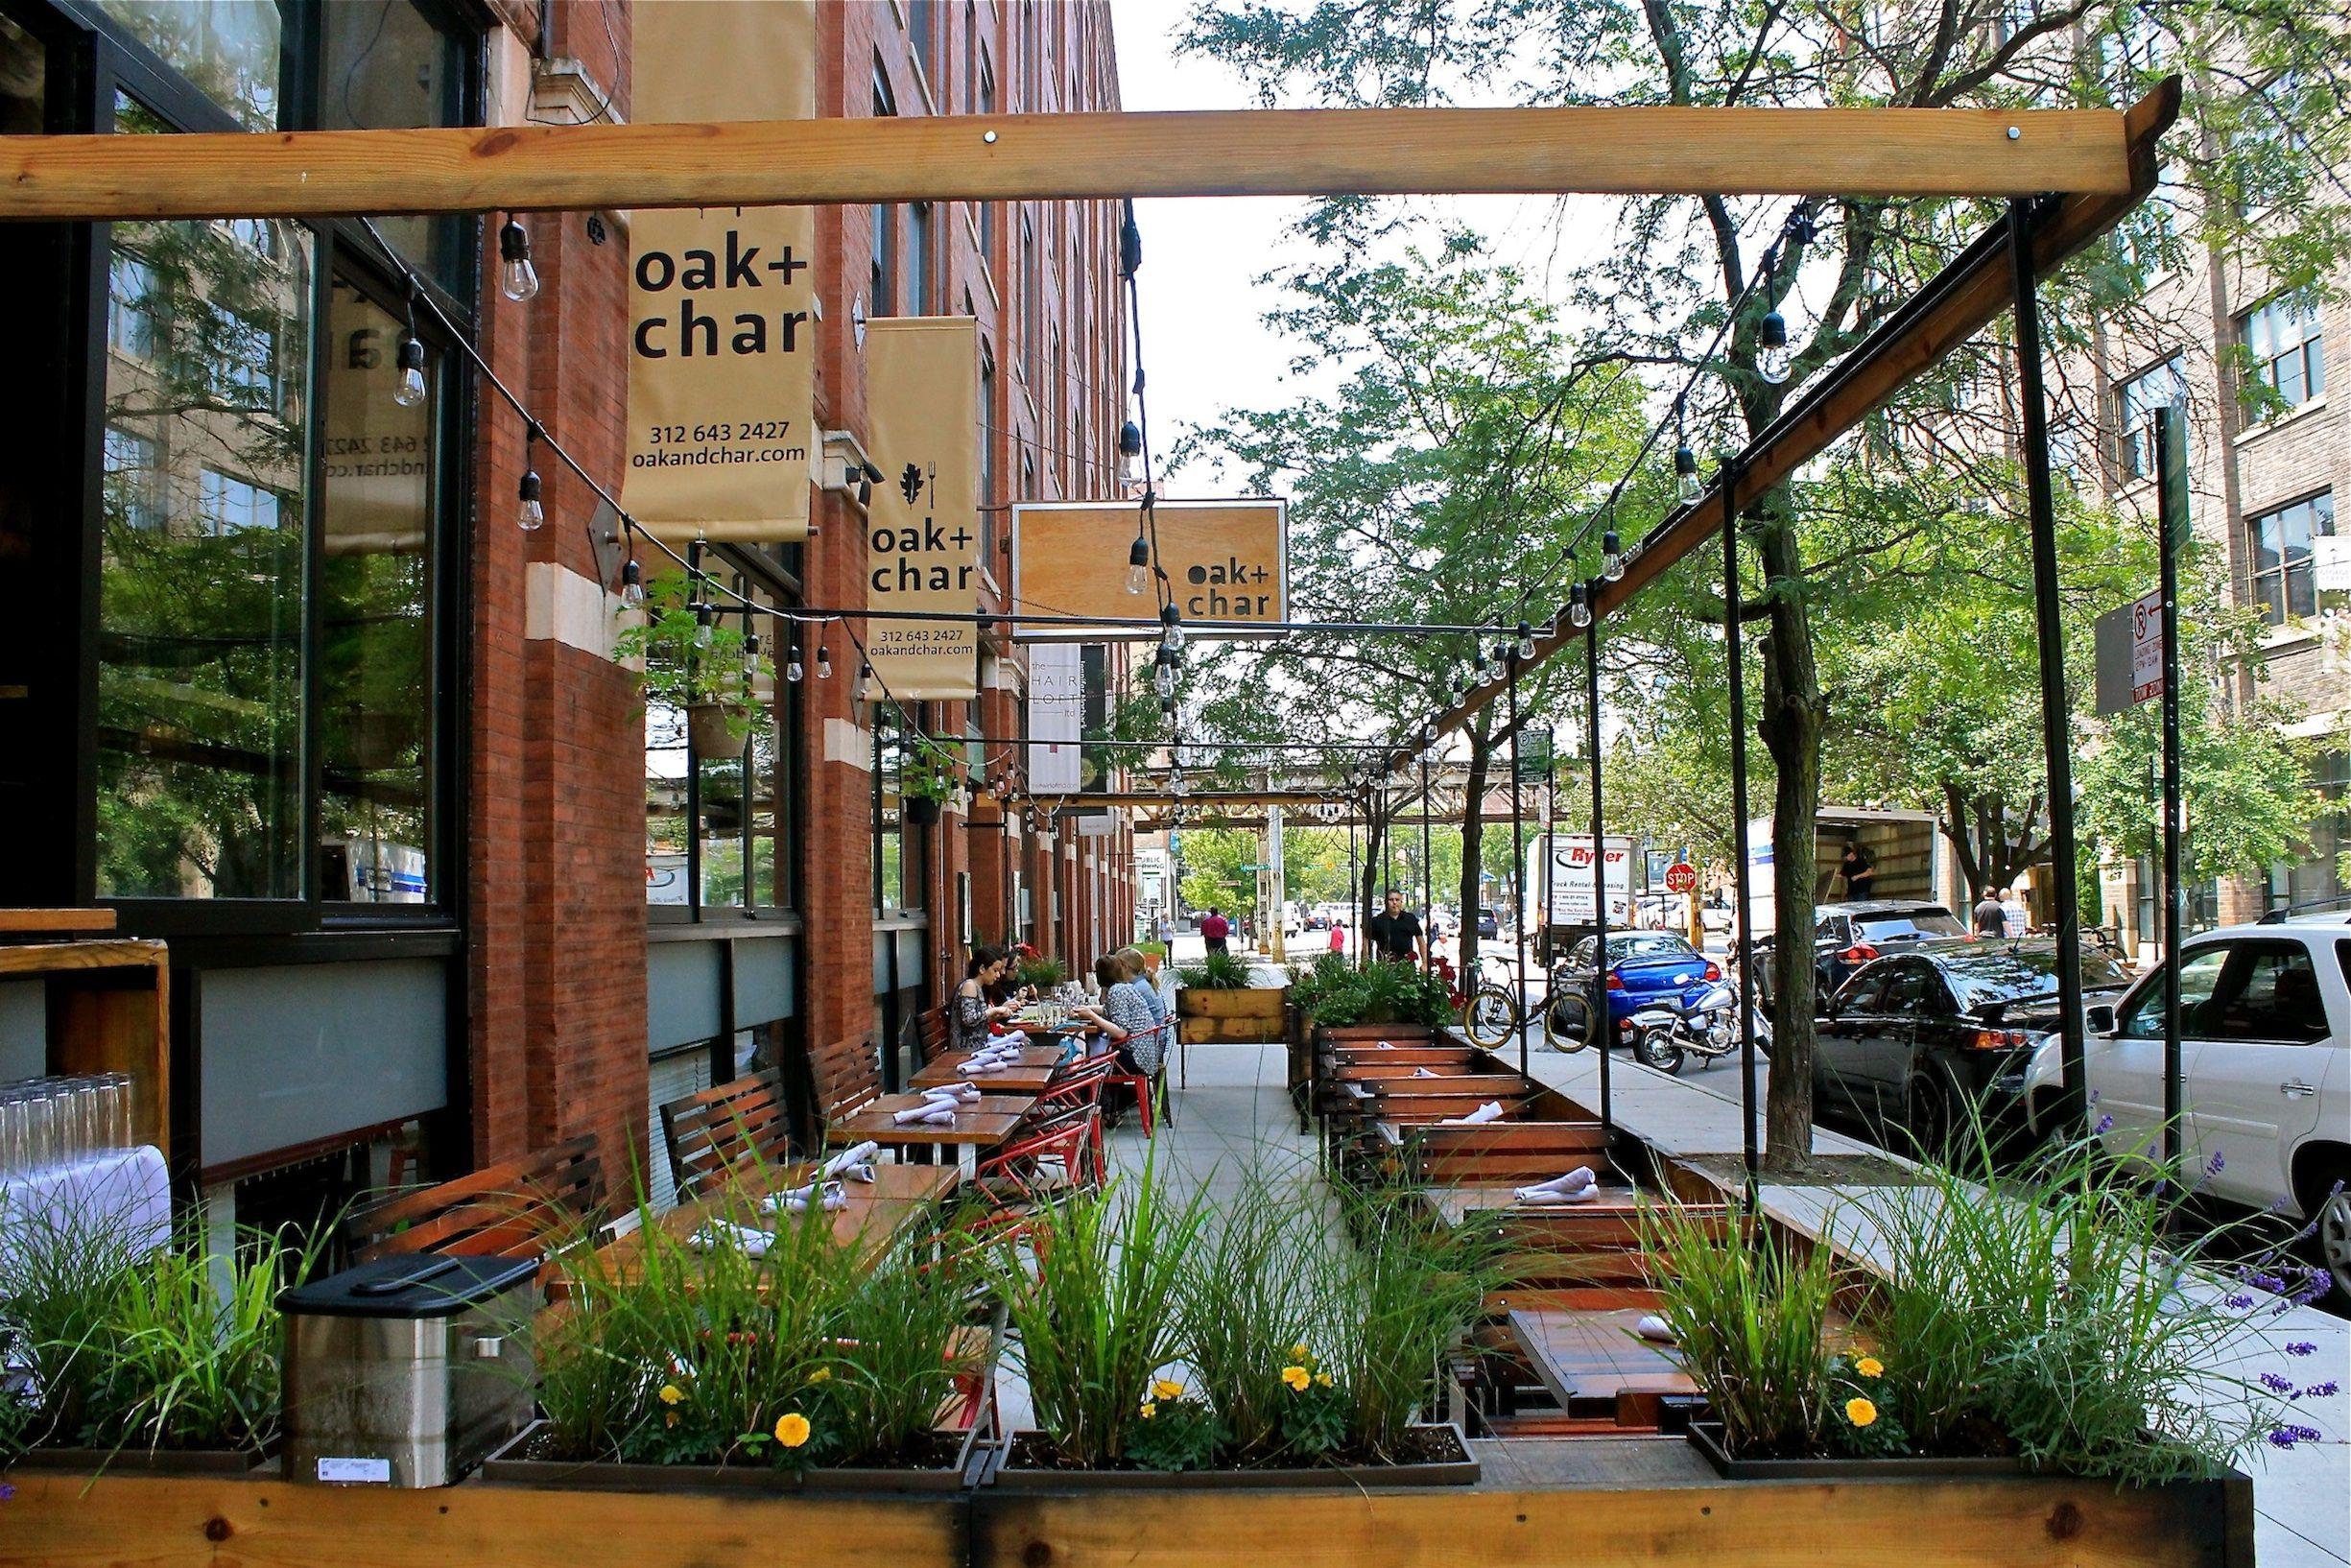 New Outdoor Seating In Chicago Restaurant Scene